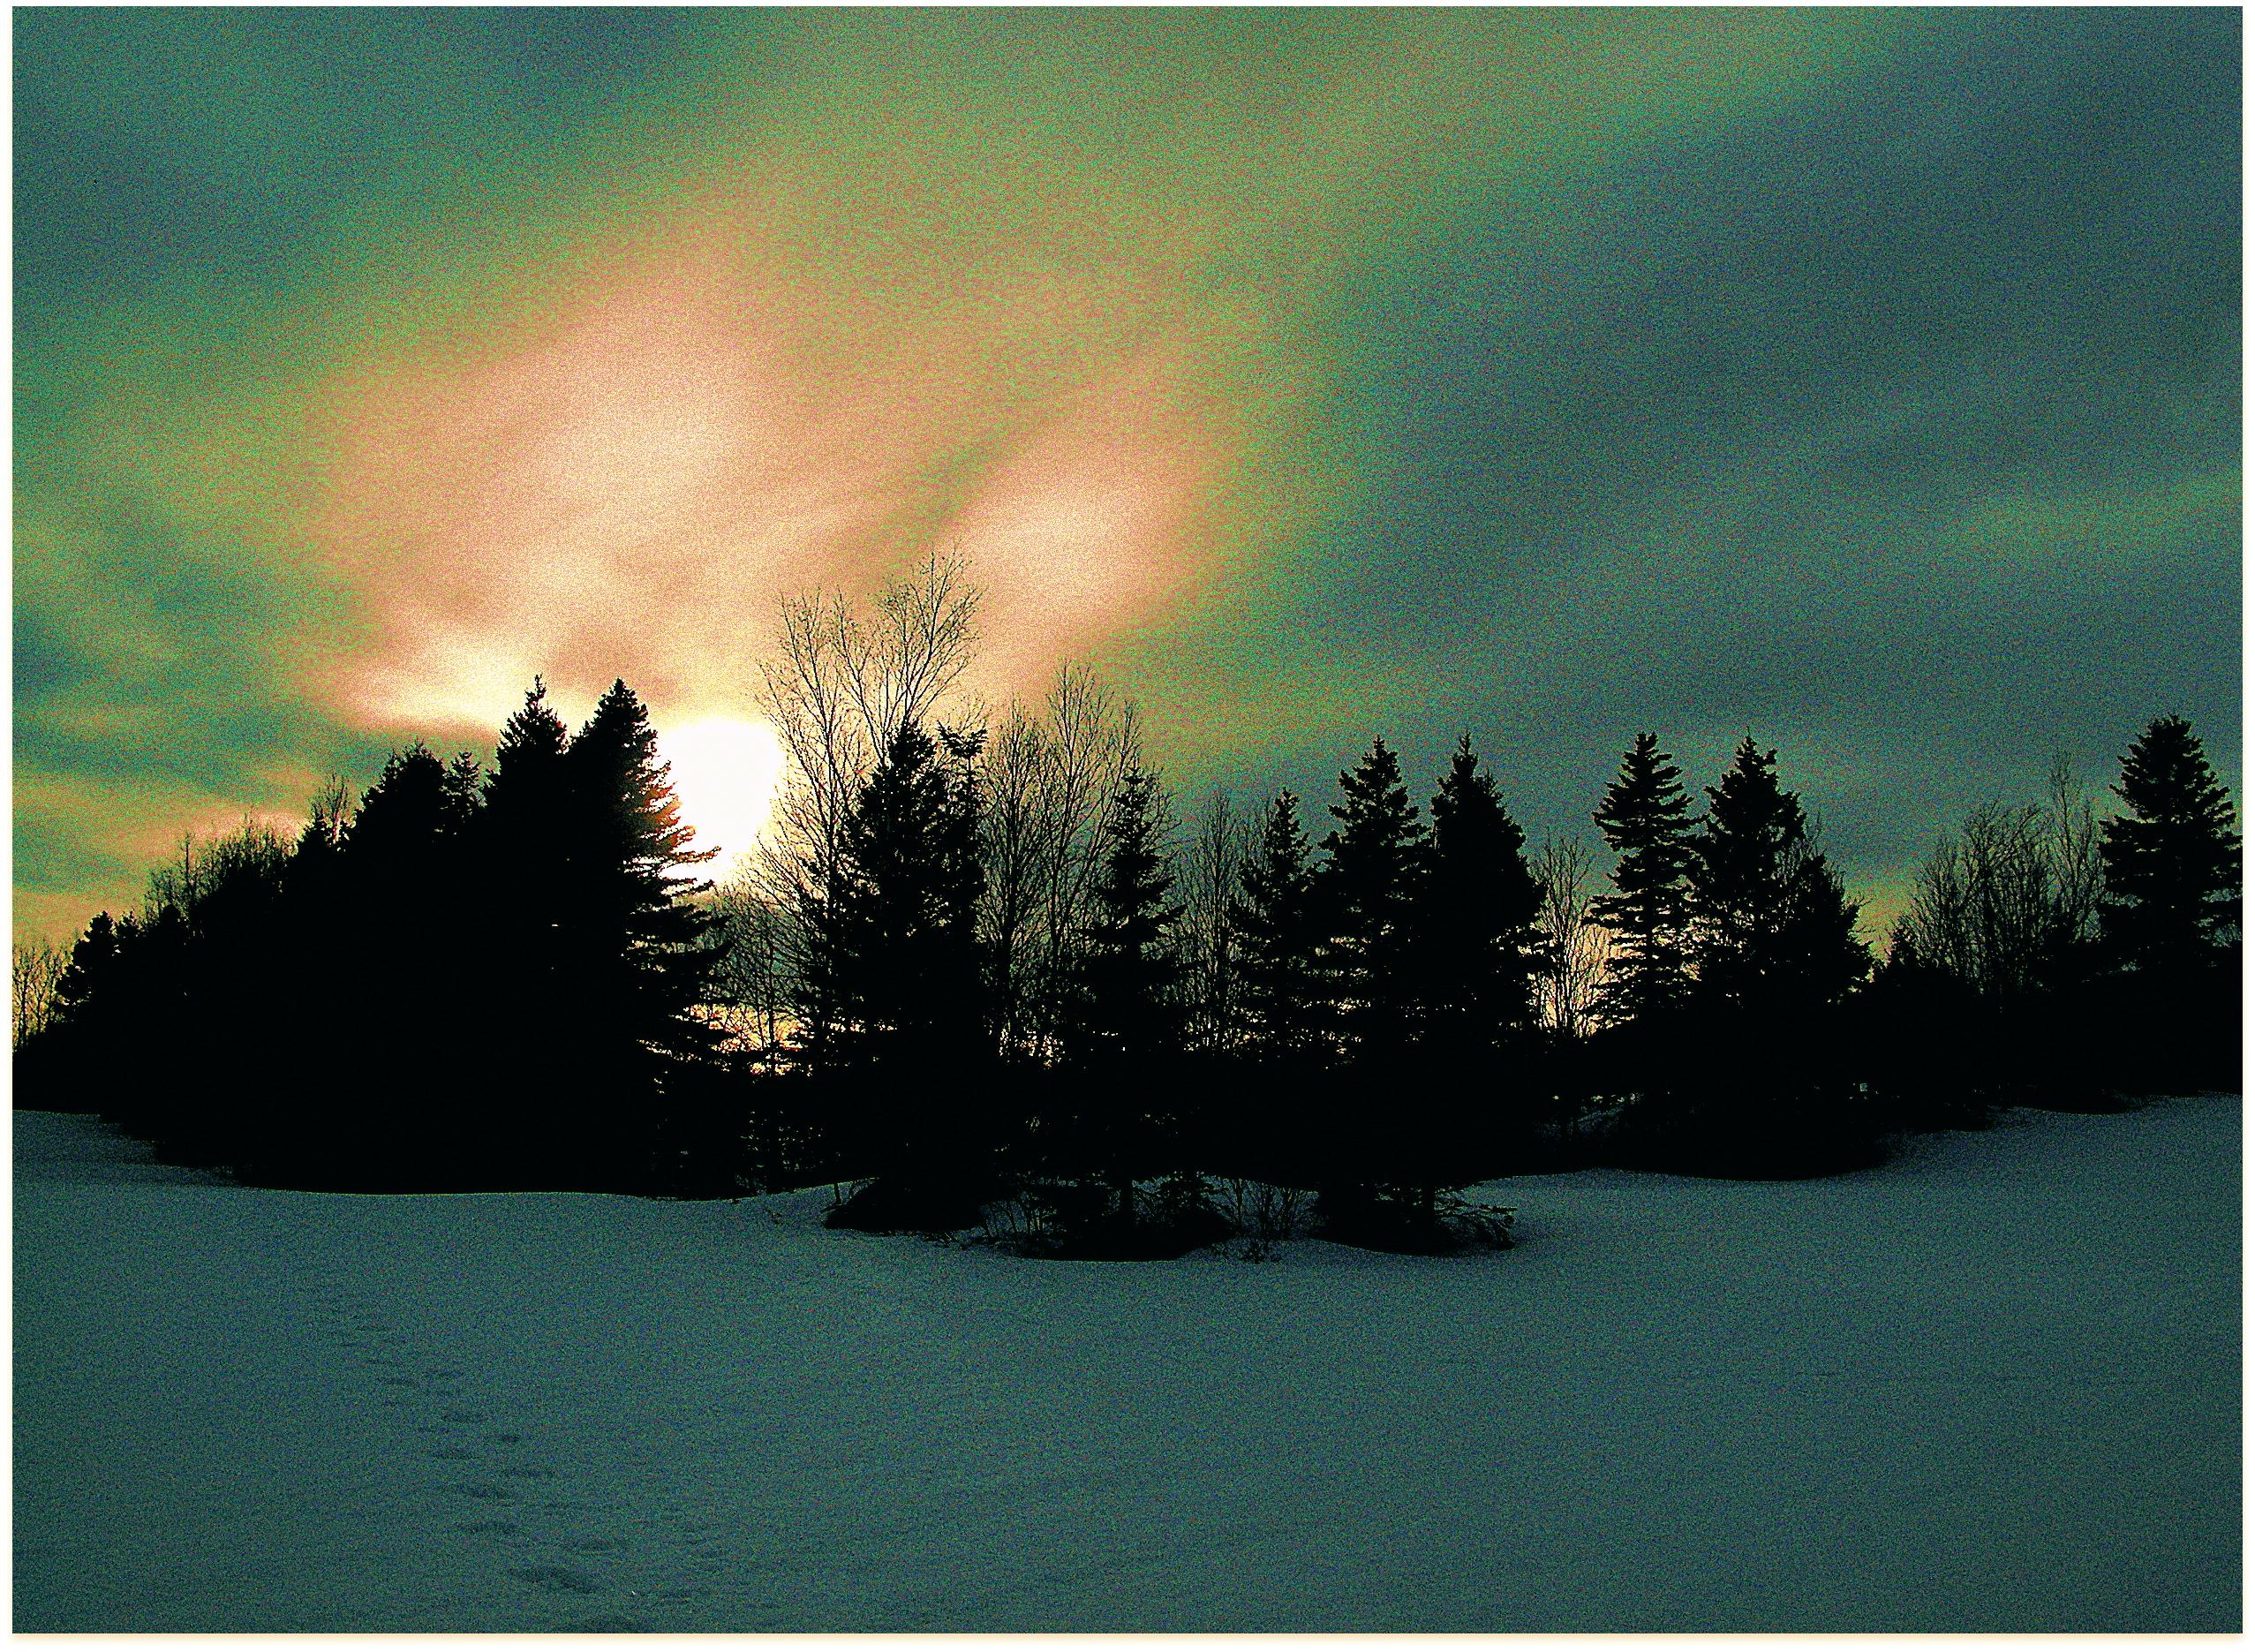 Winterdowns in Spring by surrealistic-gloom